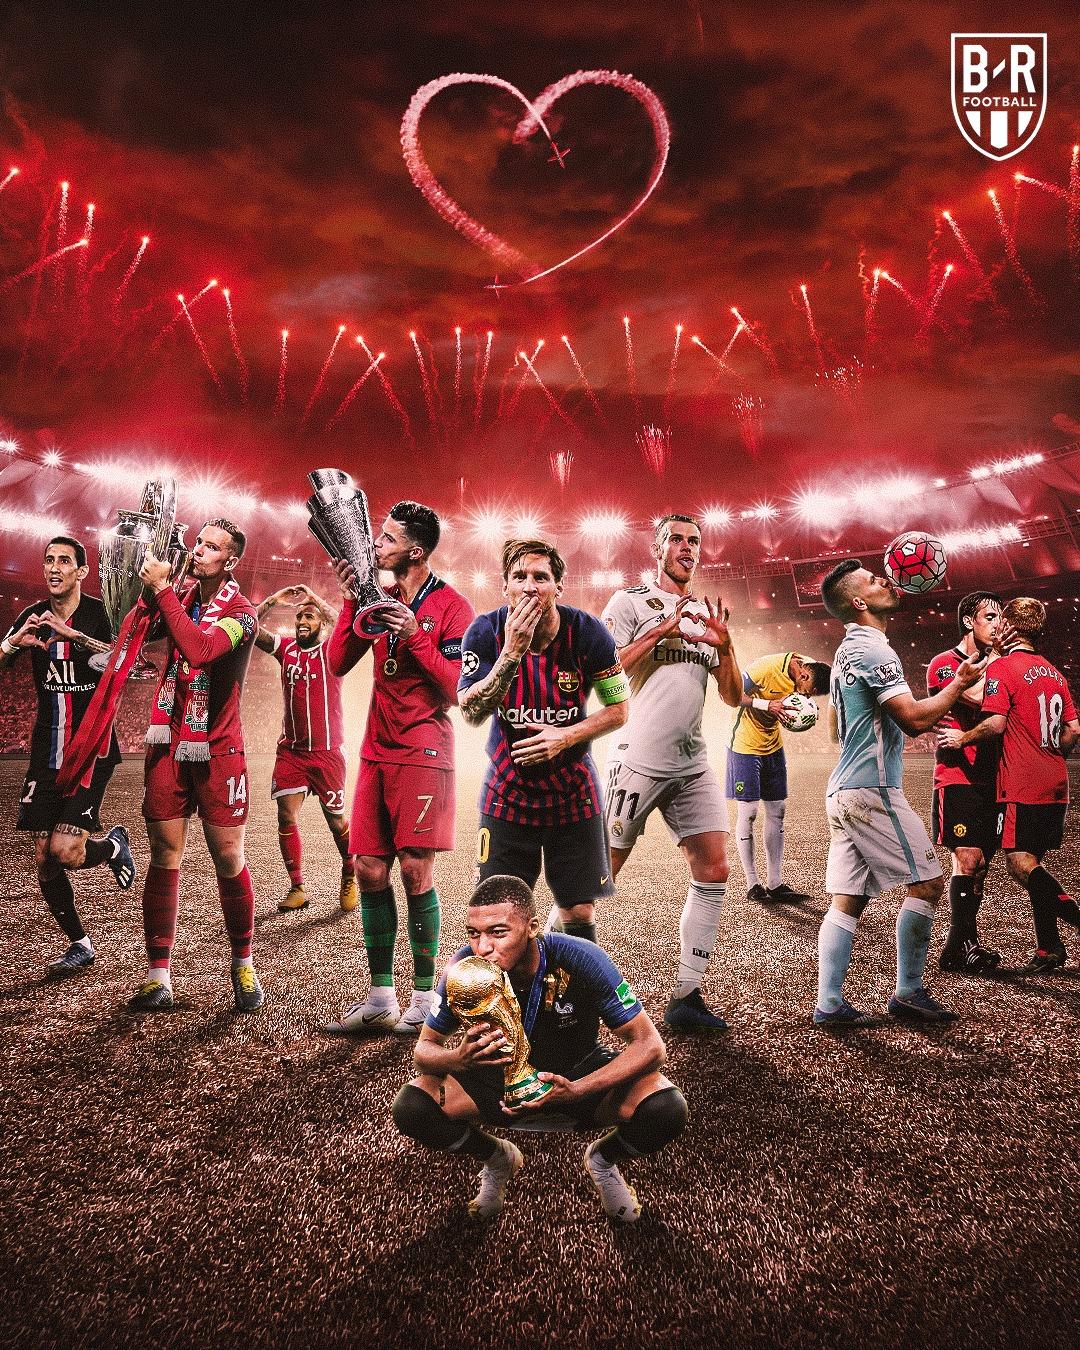 B/R海报:又是一年过节时,祝我们的真爱足球情人节快乐